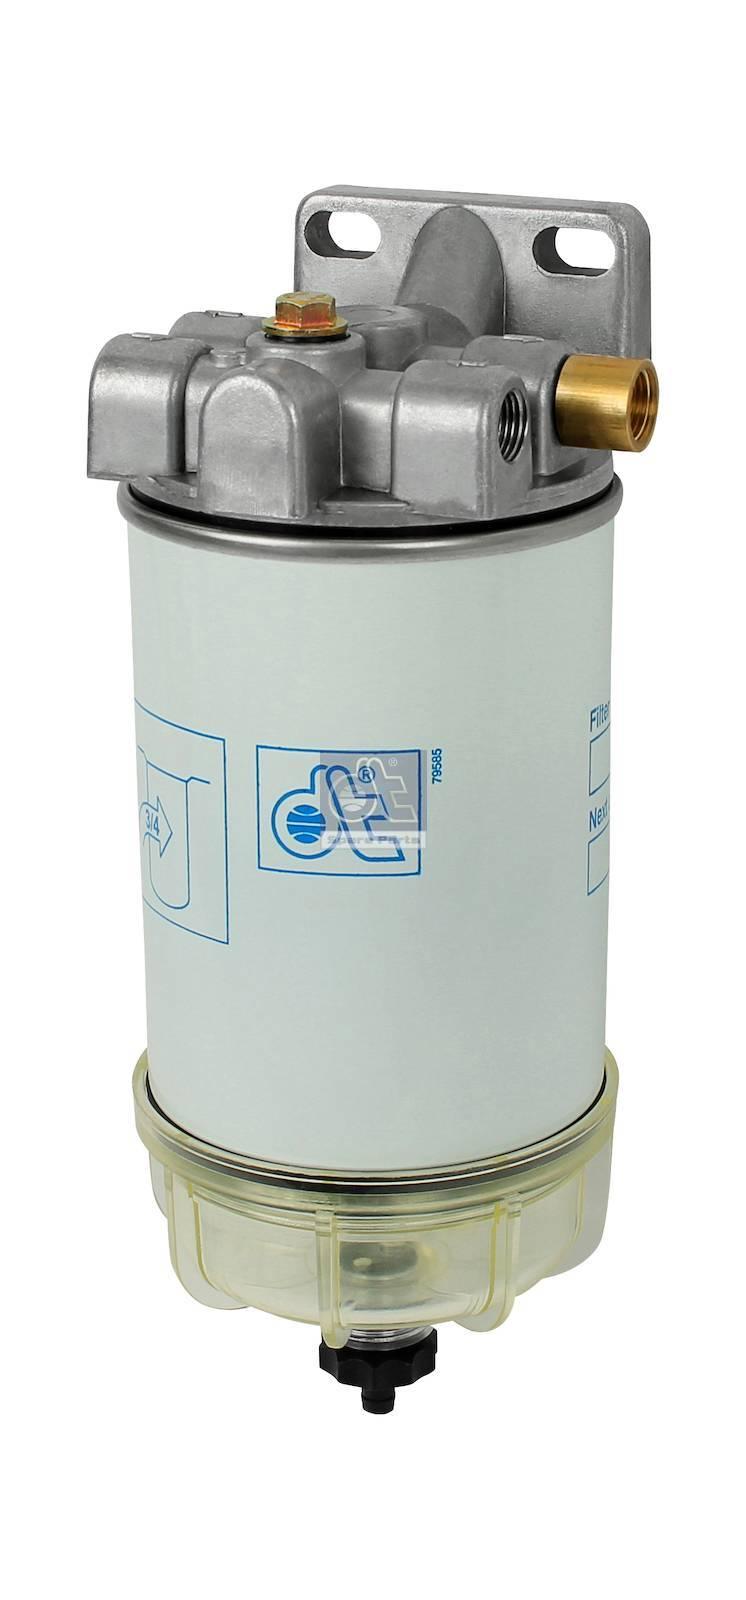 Fuel filter, complete